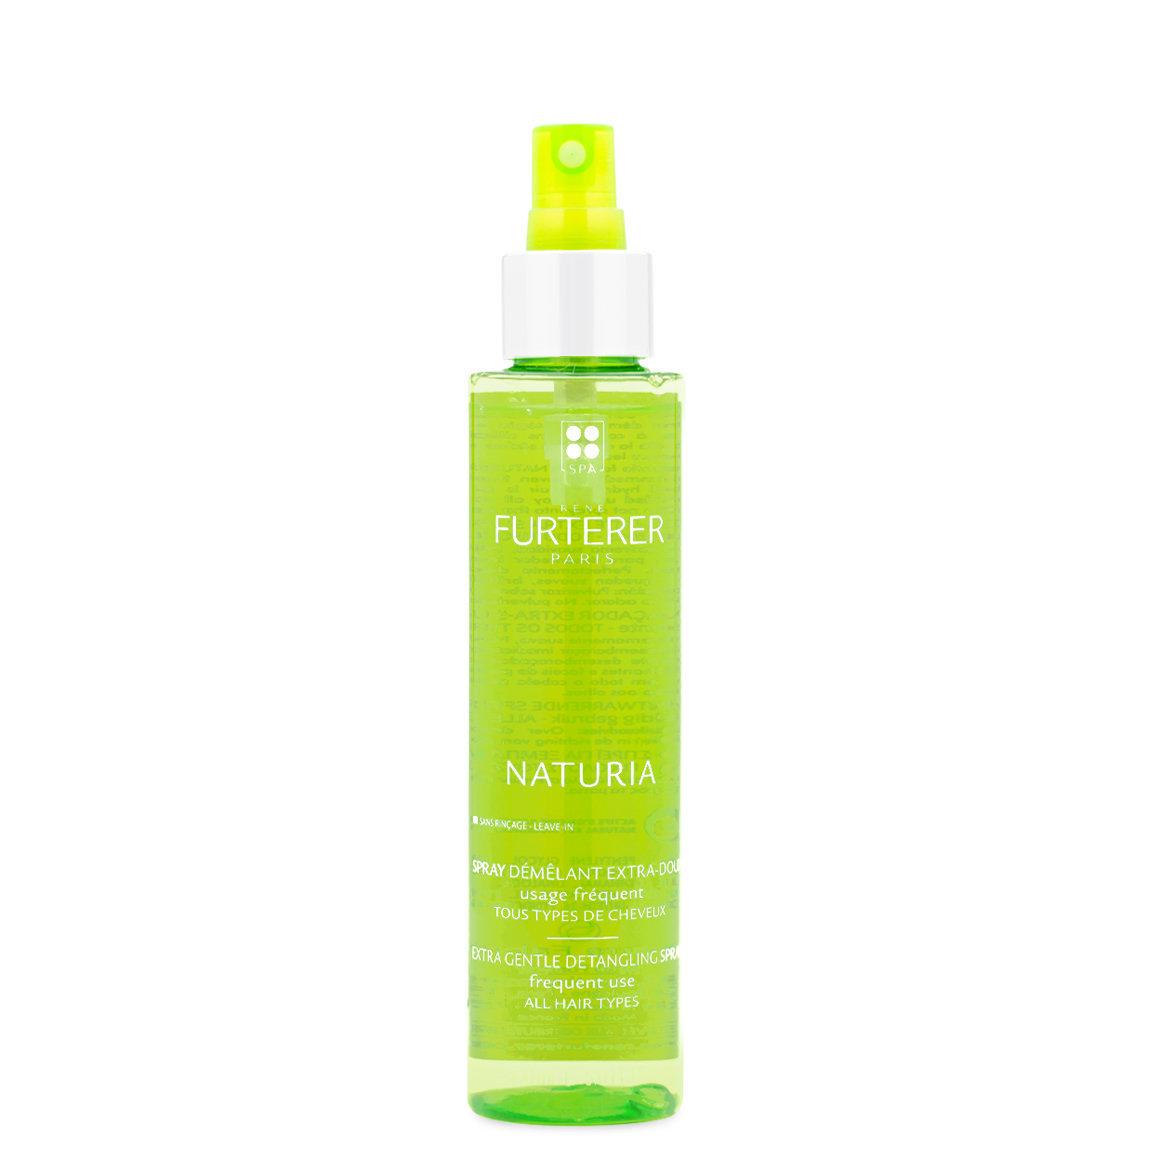 Rene Furterer Naturia Detangling Spray product swatch.